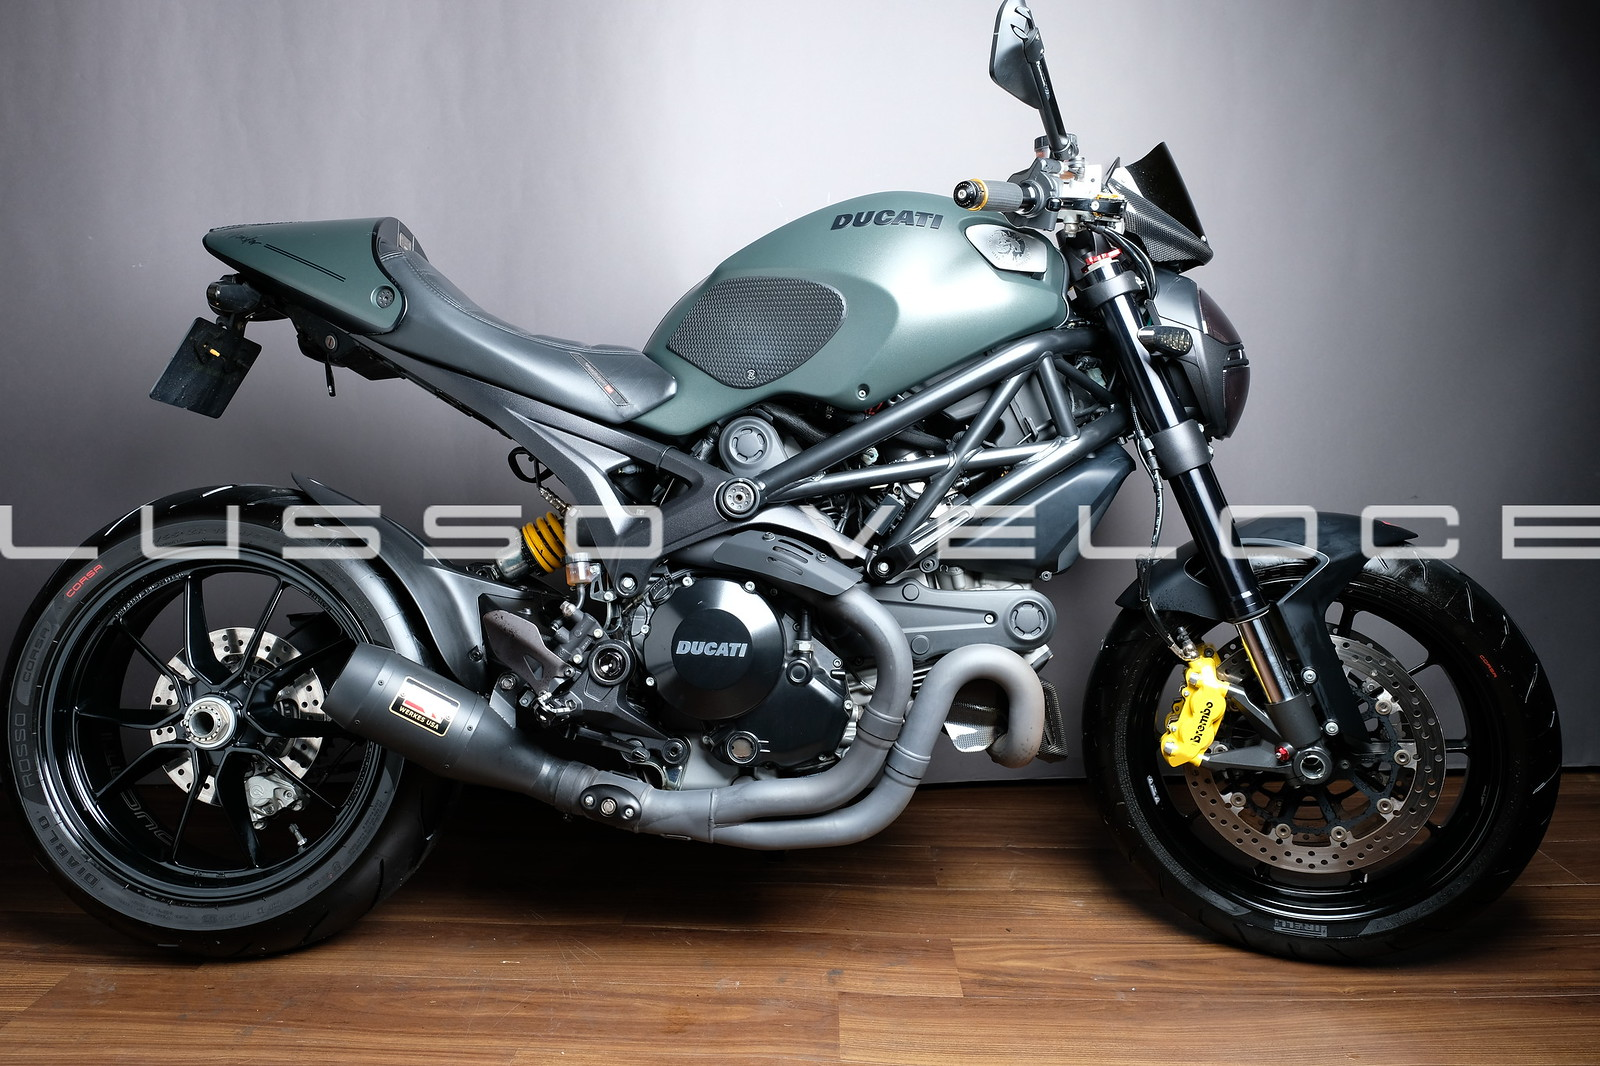 Ducati Monster 1100 Diesel special edition